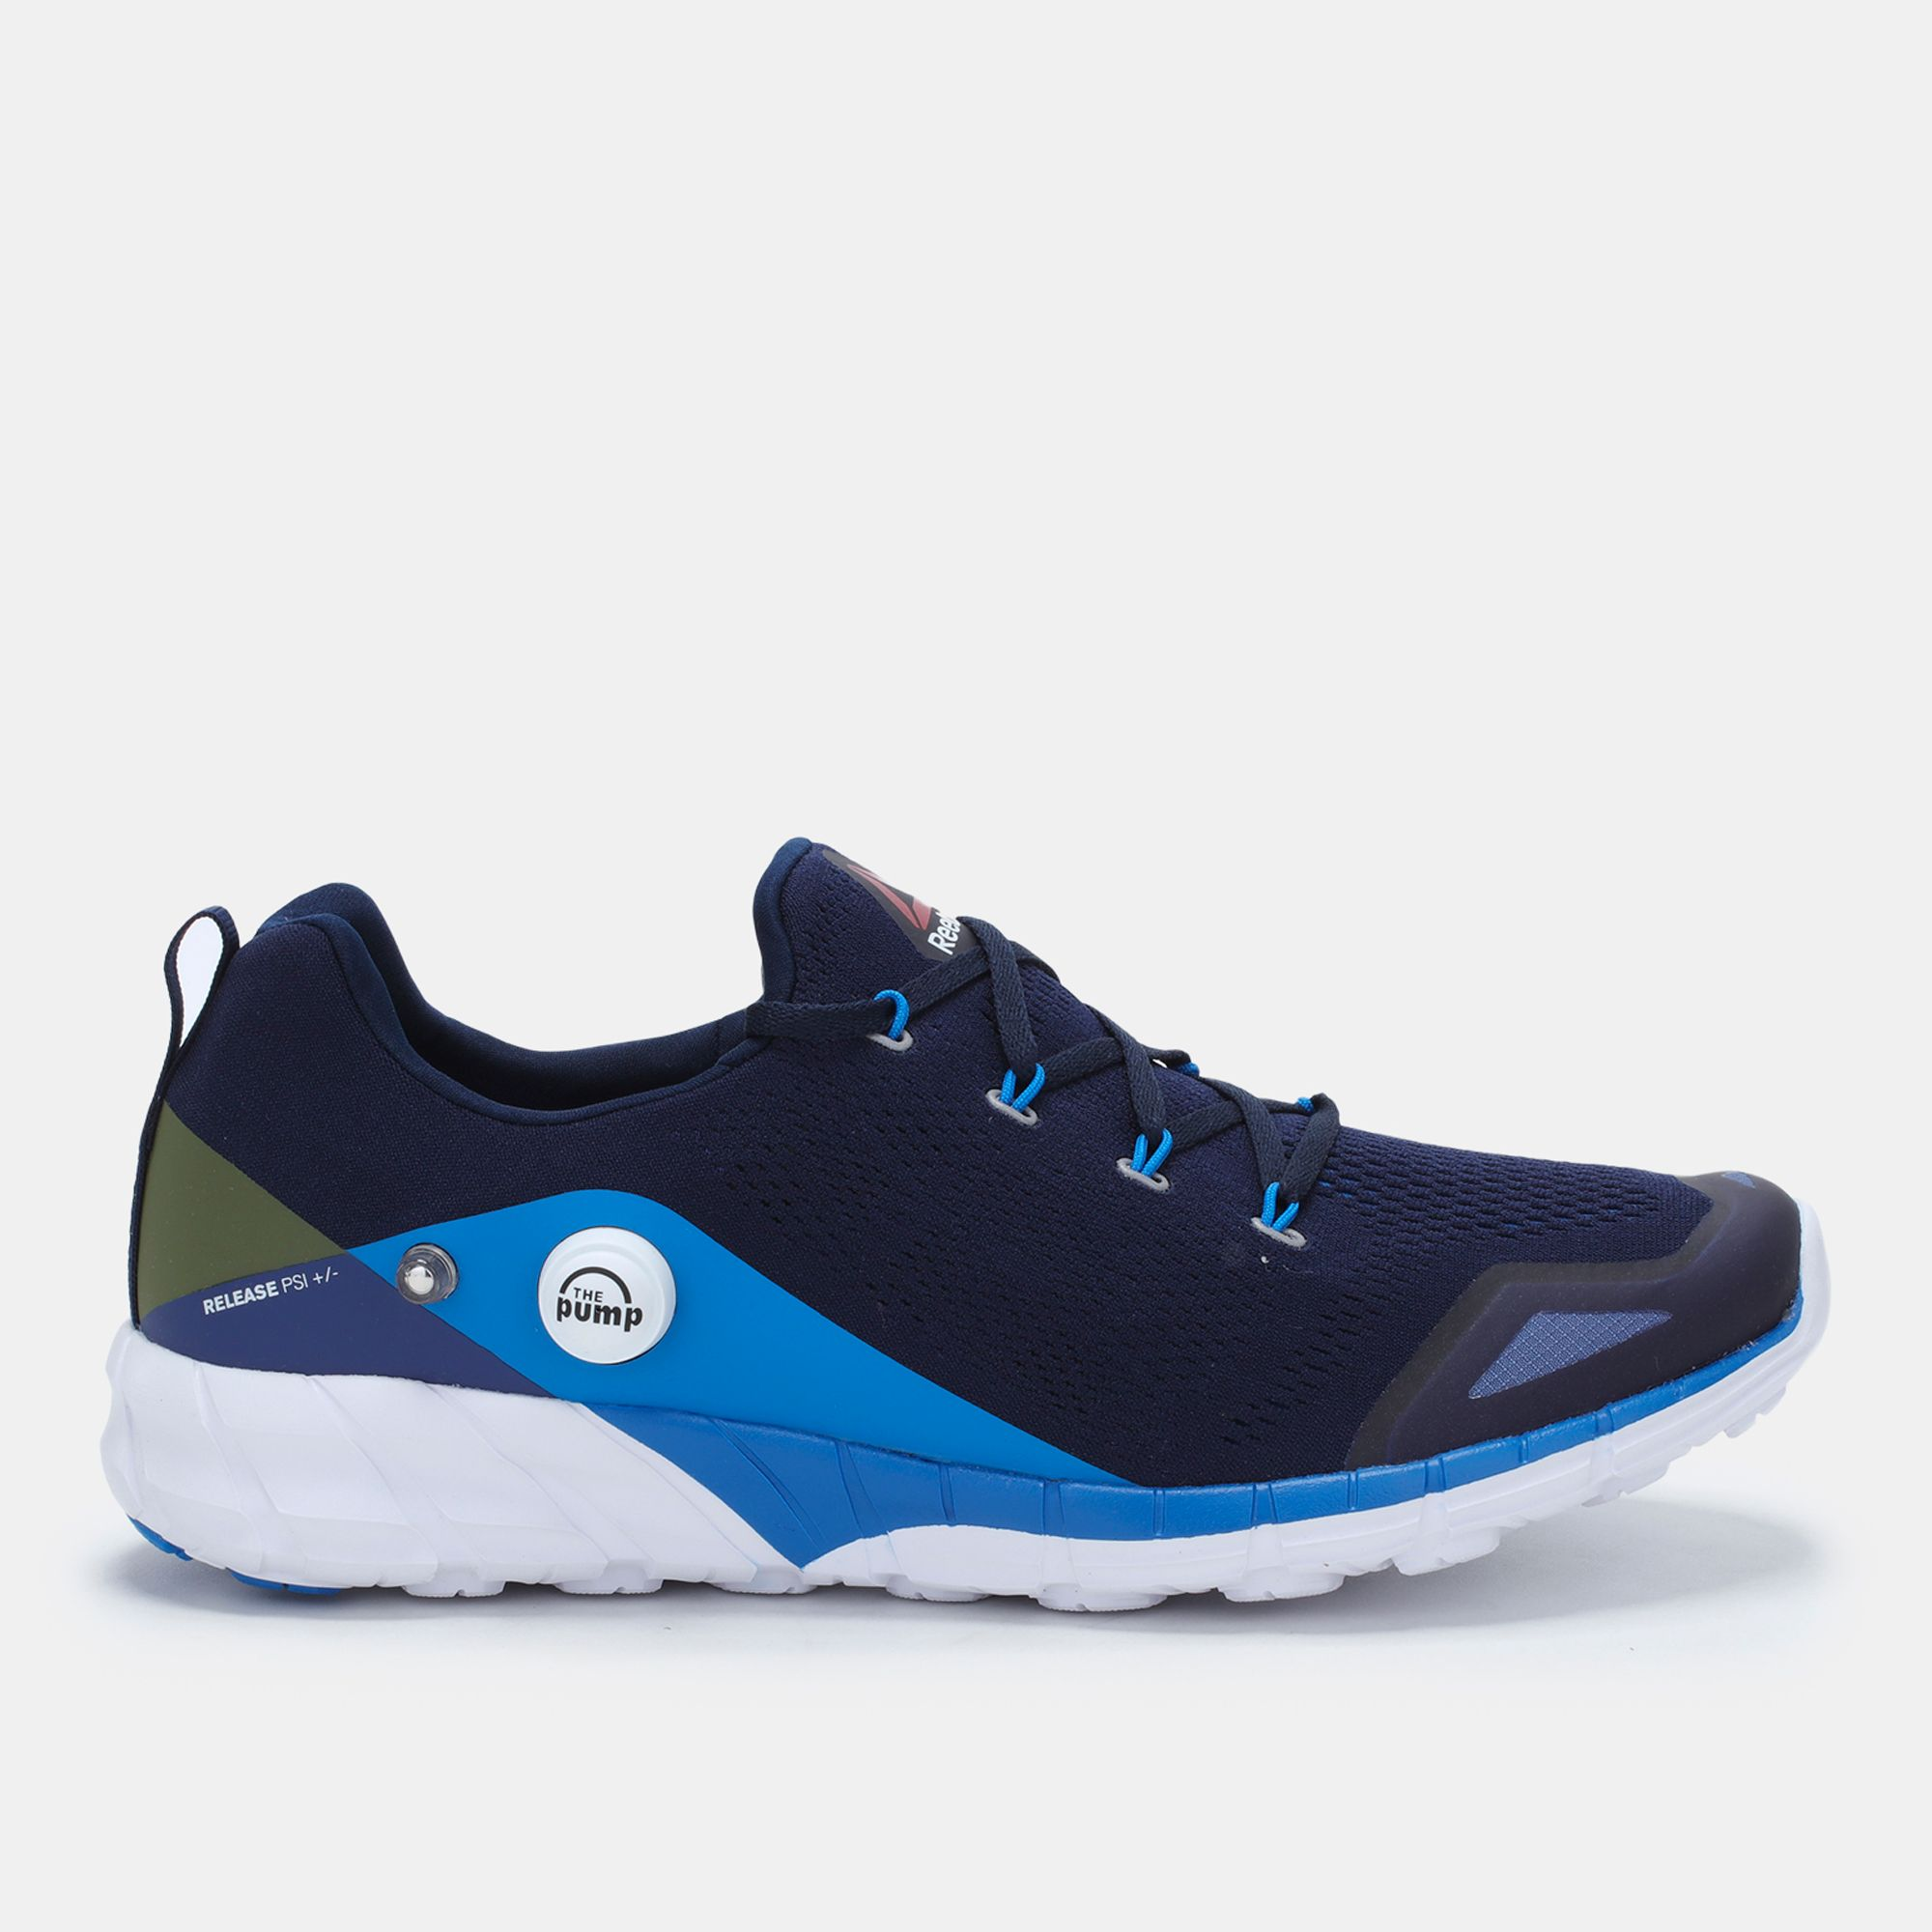 aafab0c1b1a best sell a6437 5101a reebok zpump fusion reebok shoes menreebok ...